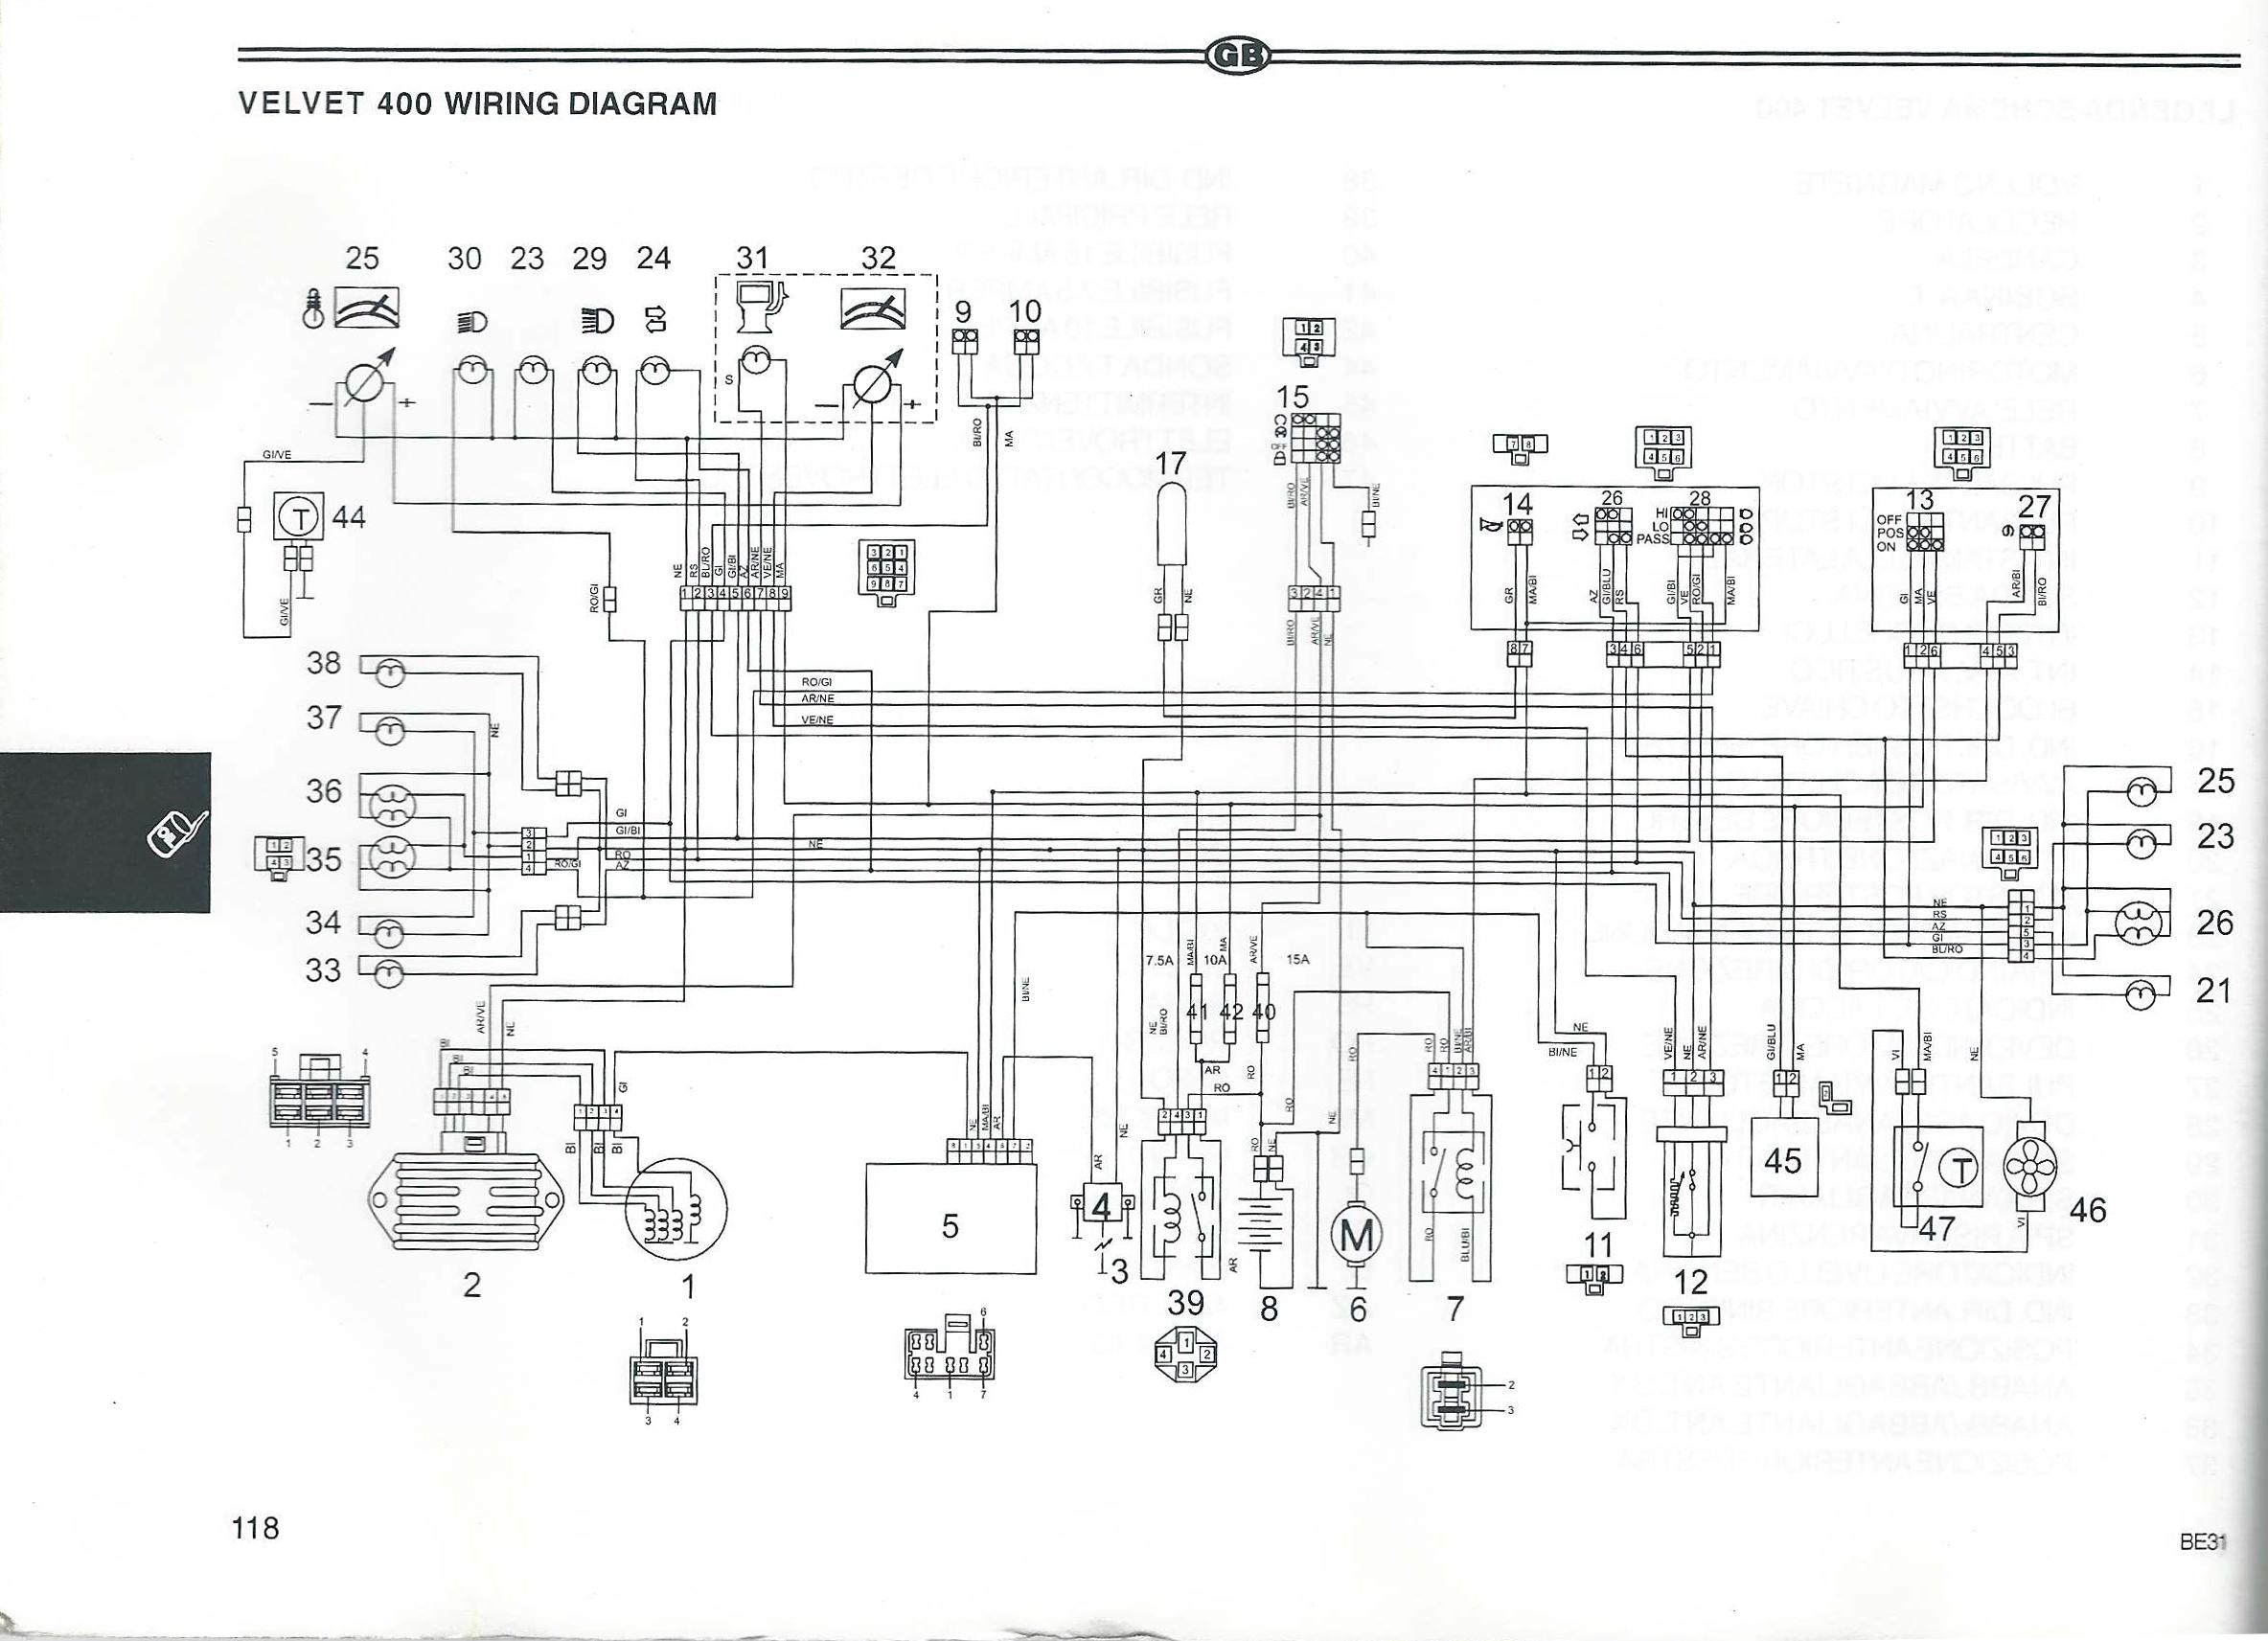 benelli wiring diagram